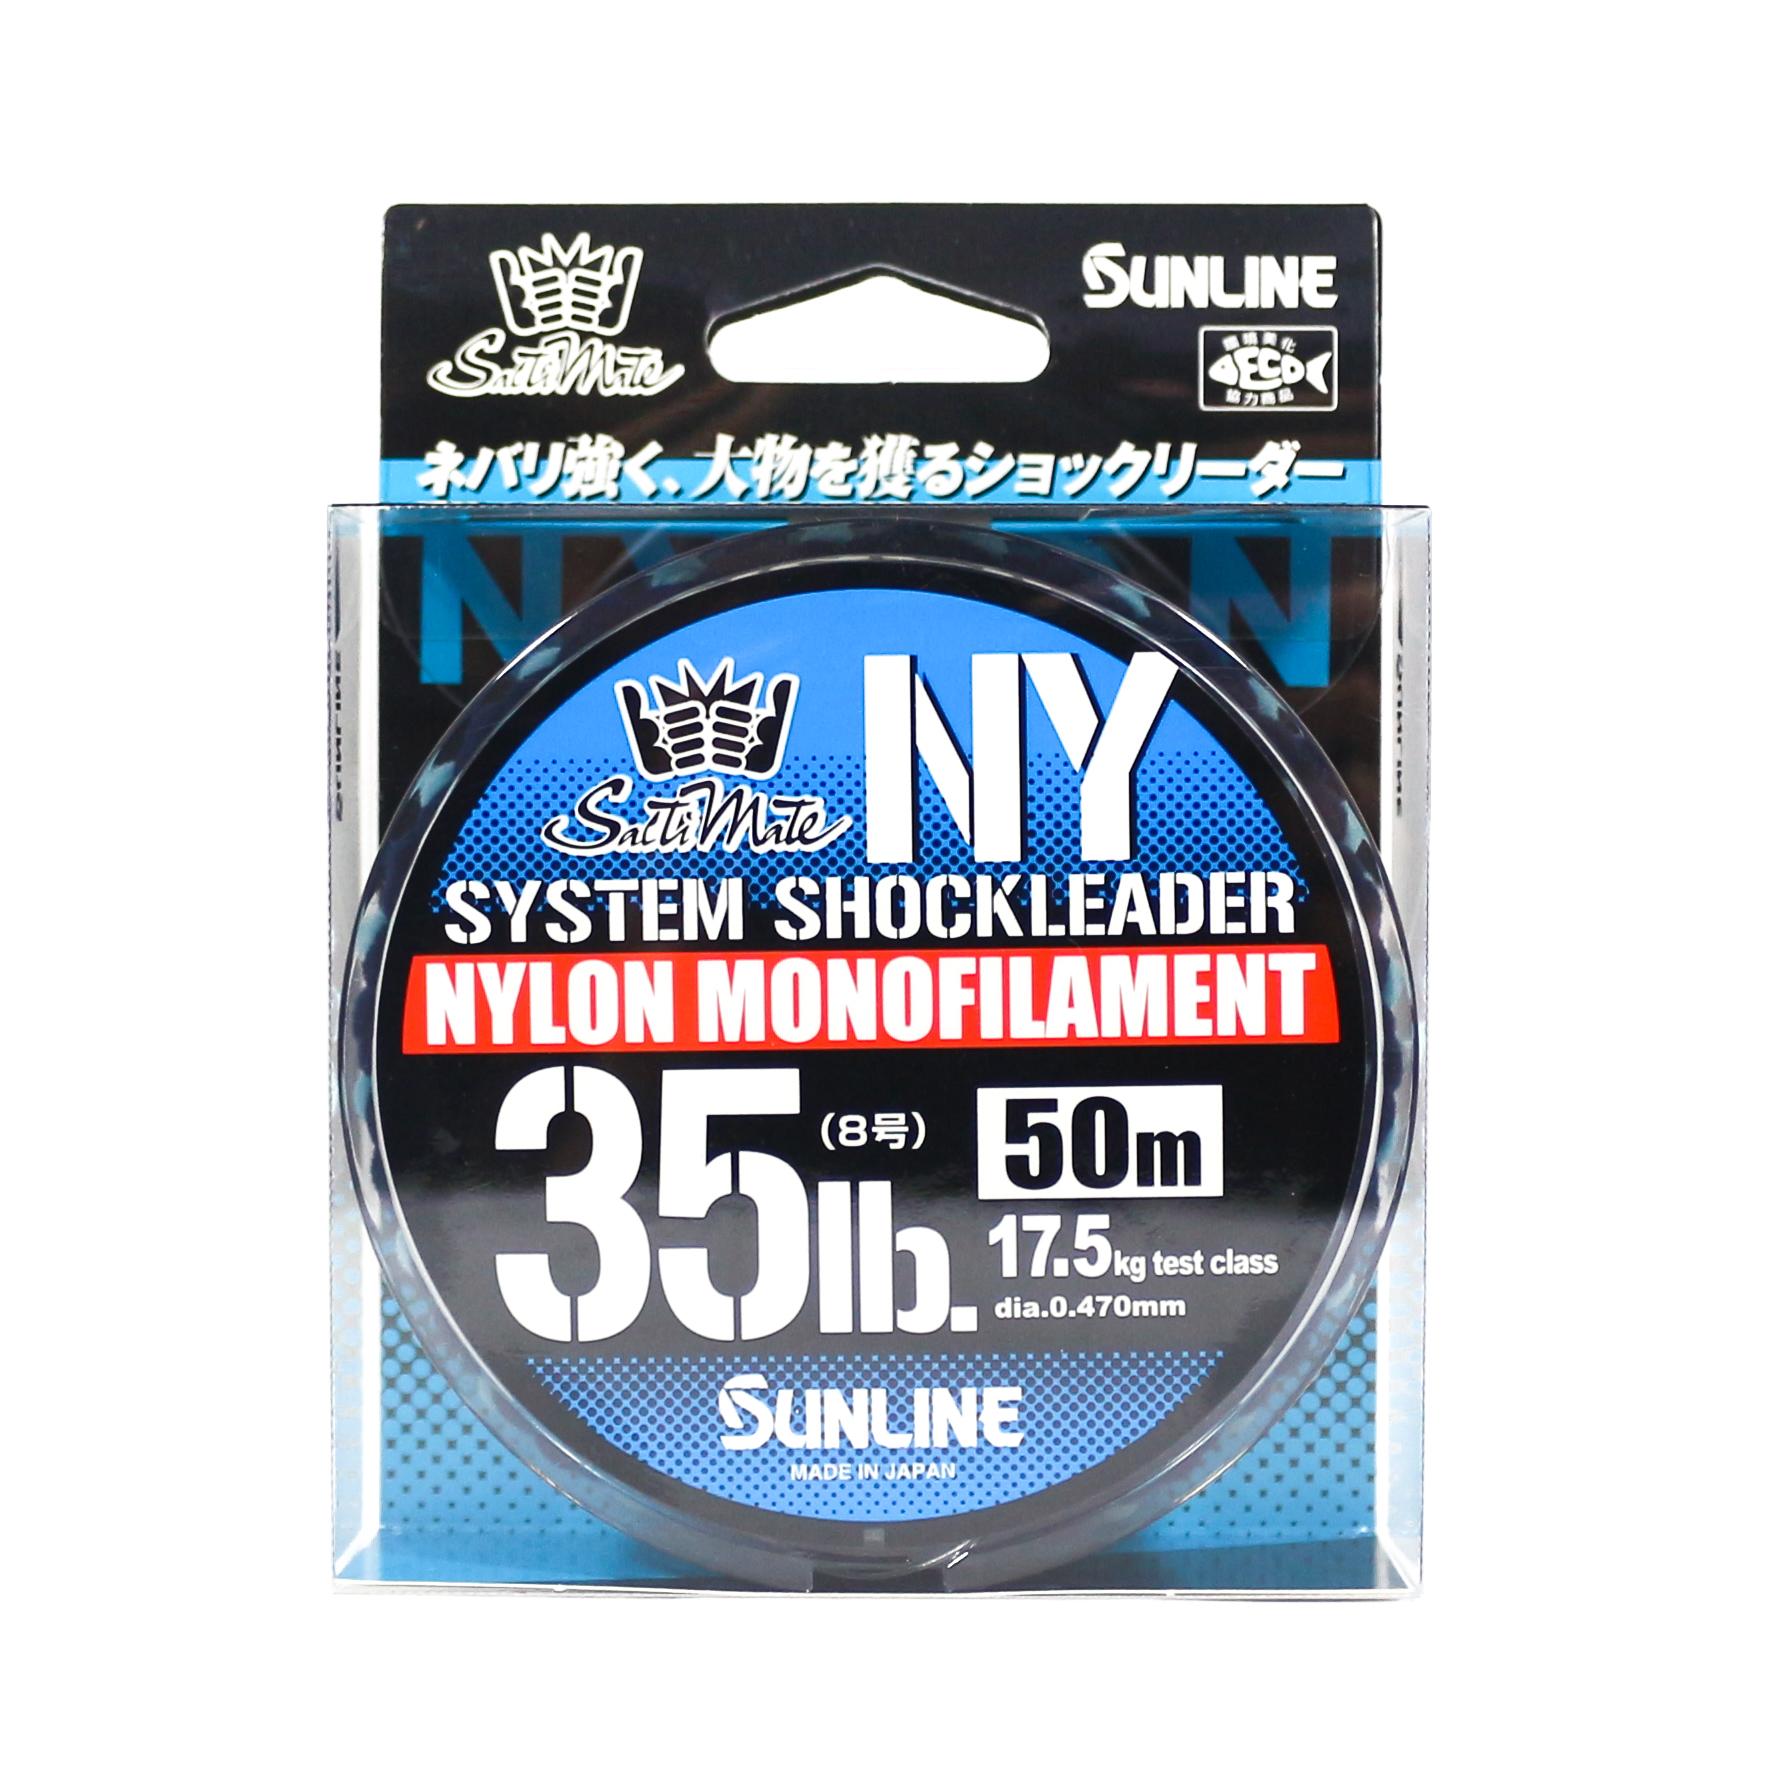 Sunline NY System Shock Leader Nylon 50m 35lb (9314)